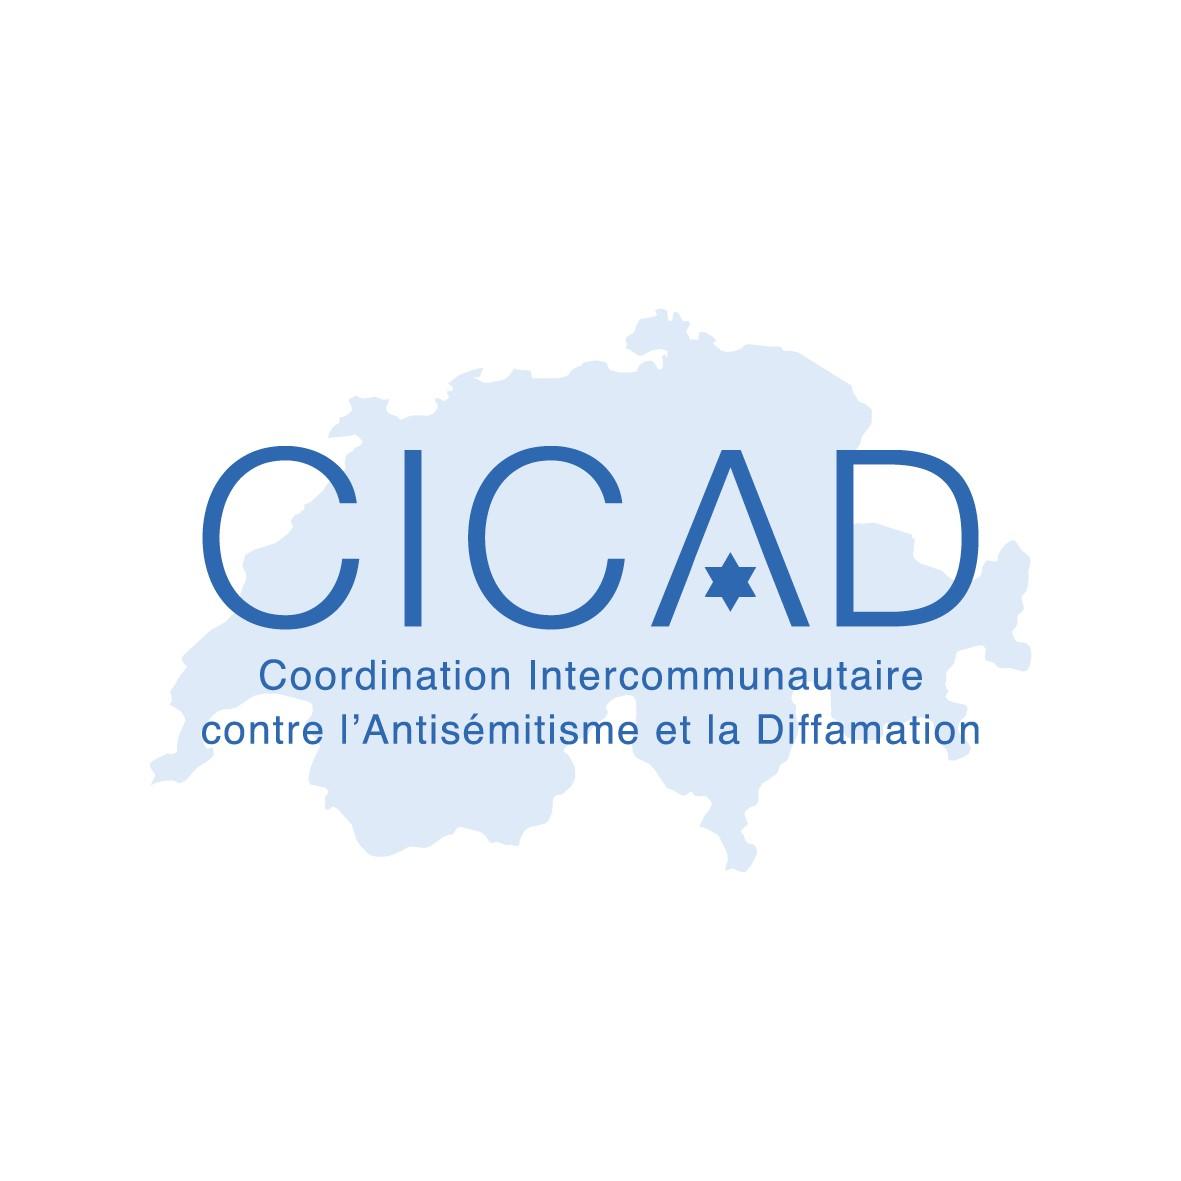 cicad